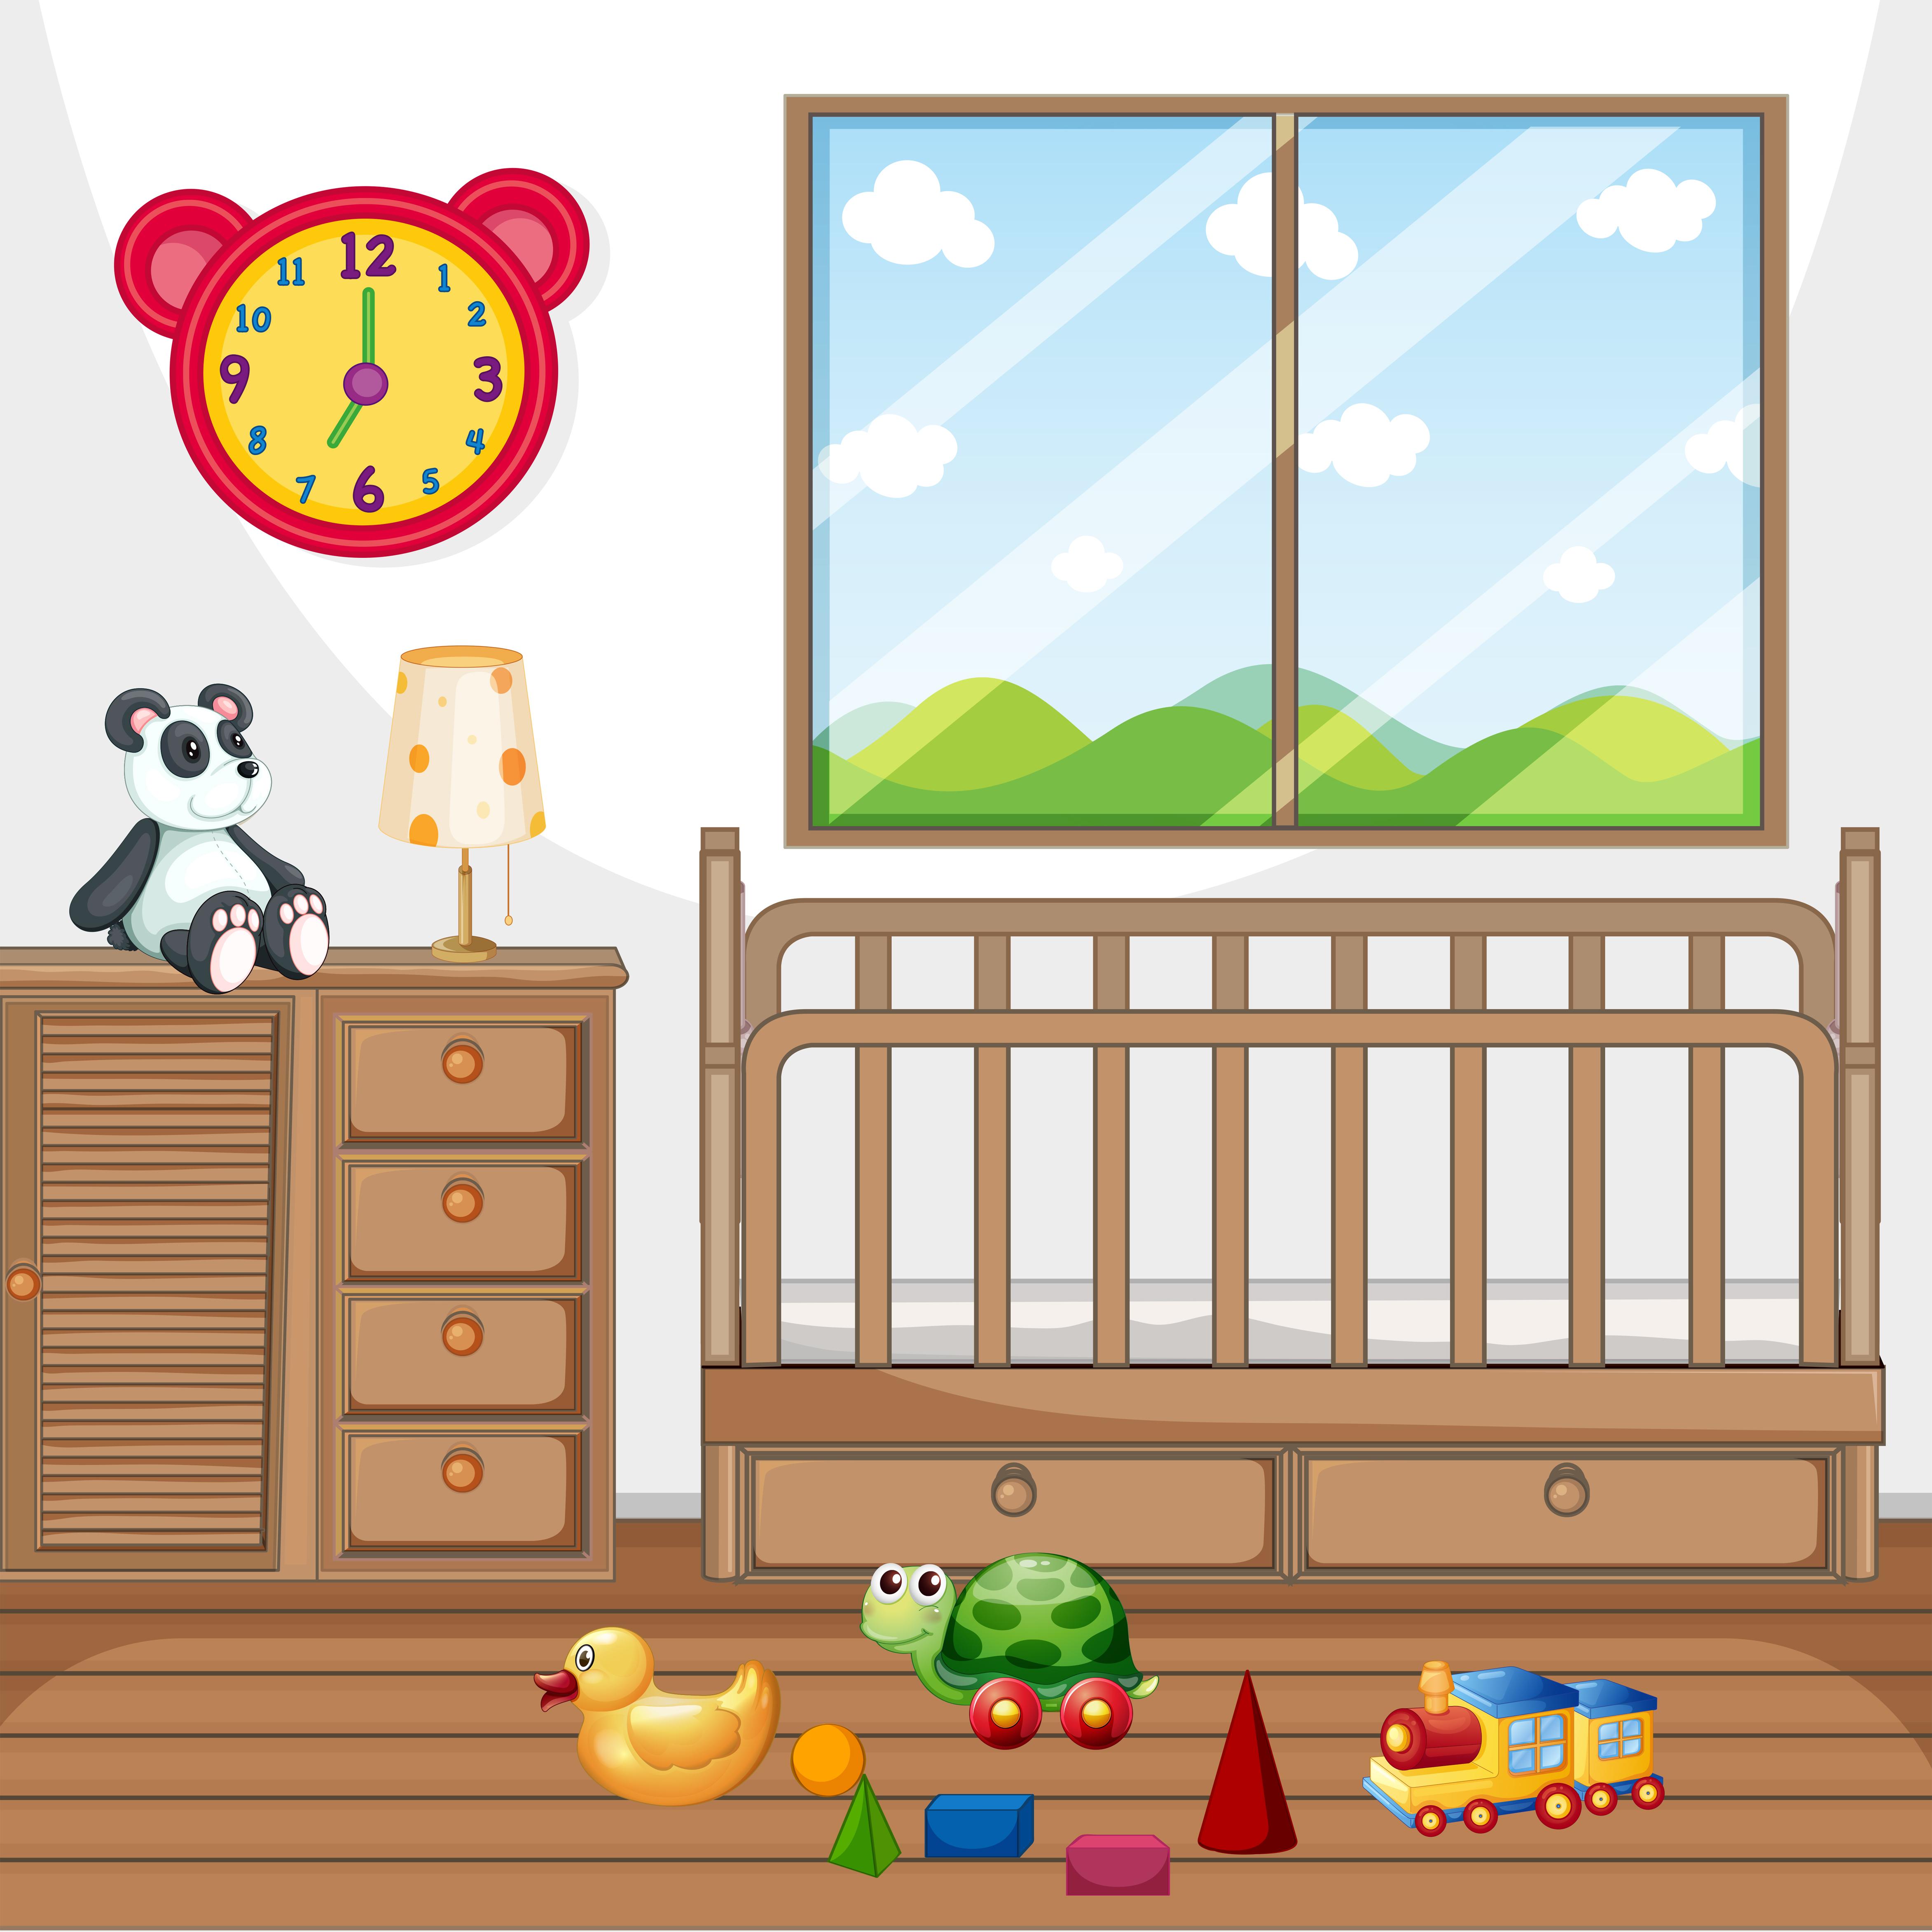 Image of: Child Bedroom With Wooden Furniture Download Free Vectors Clipart Graphics Vector Art